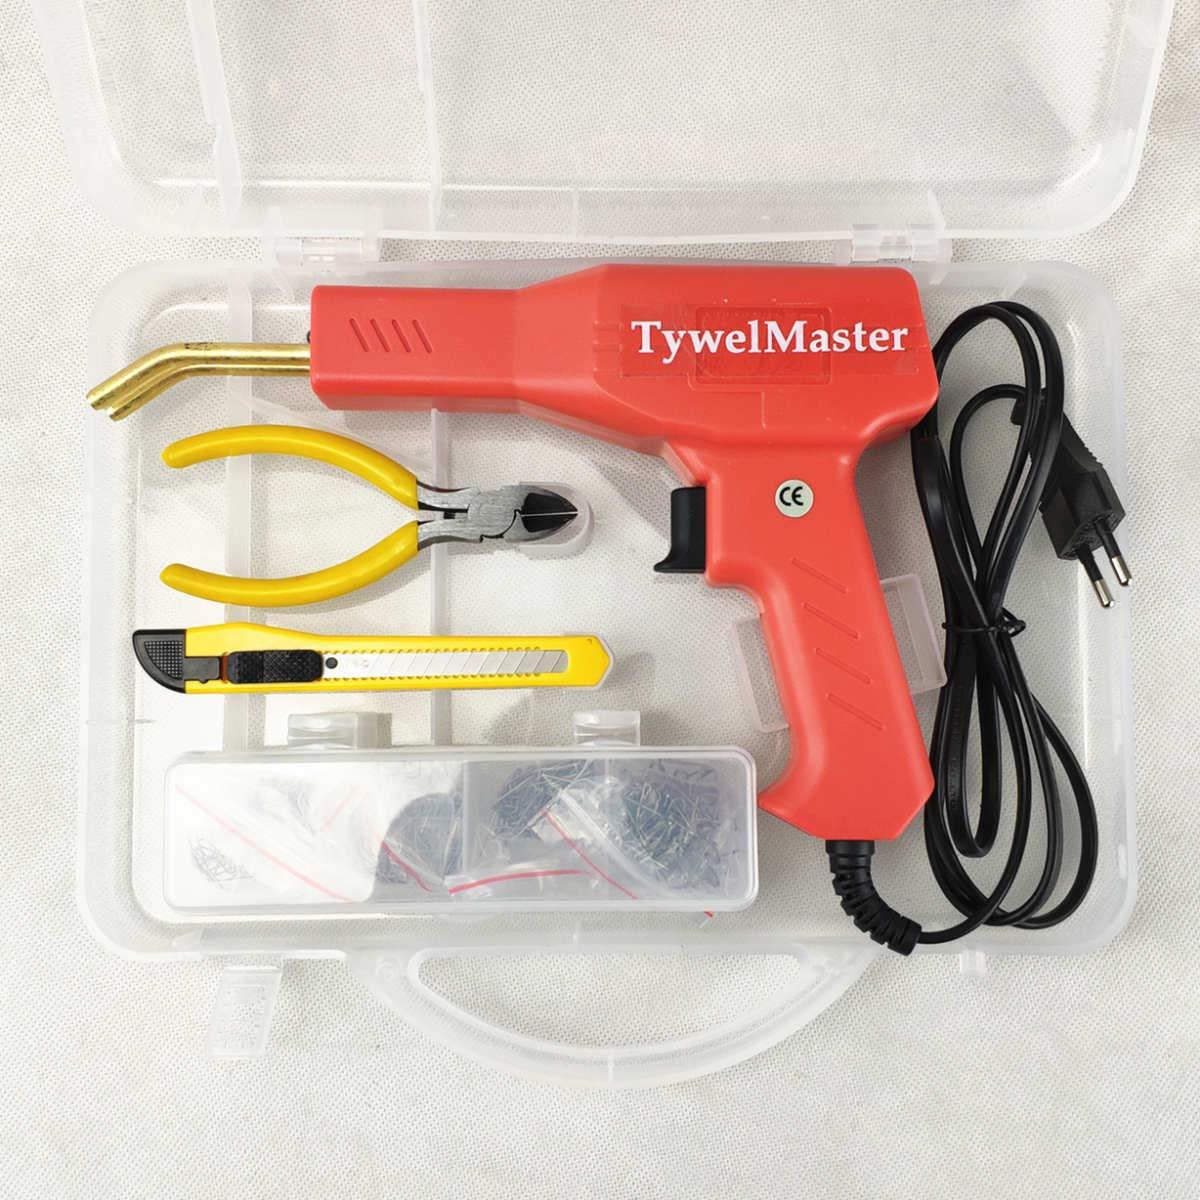 Handy Plastic Welder, Garage Tools Hot Stapler Machine PVC Plastic Repairing Machine Car Bumper Repair Hot Stapler